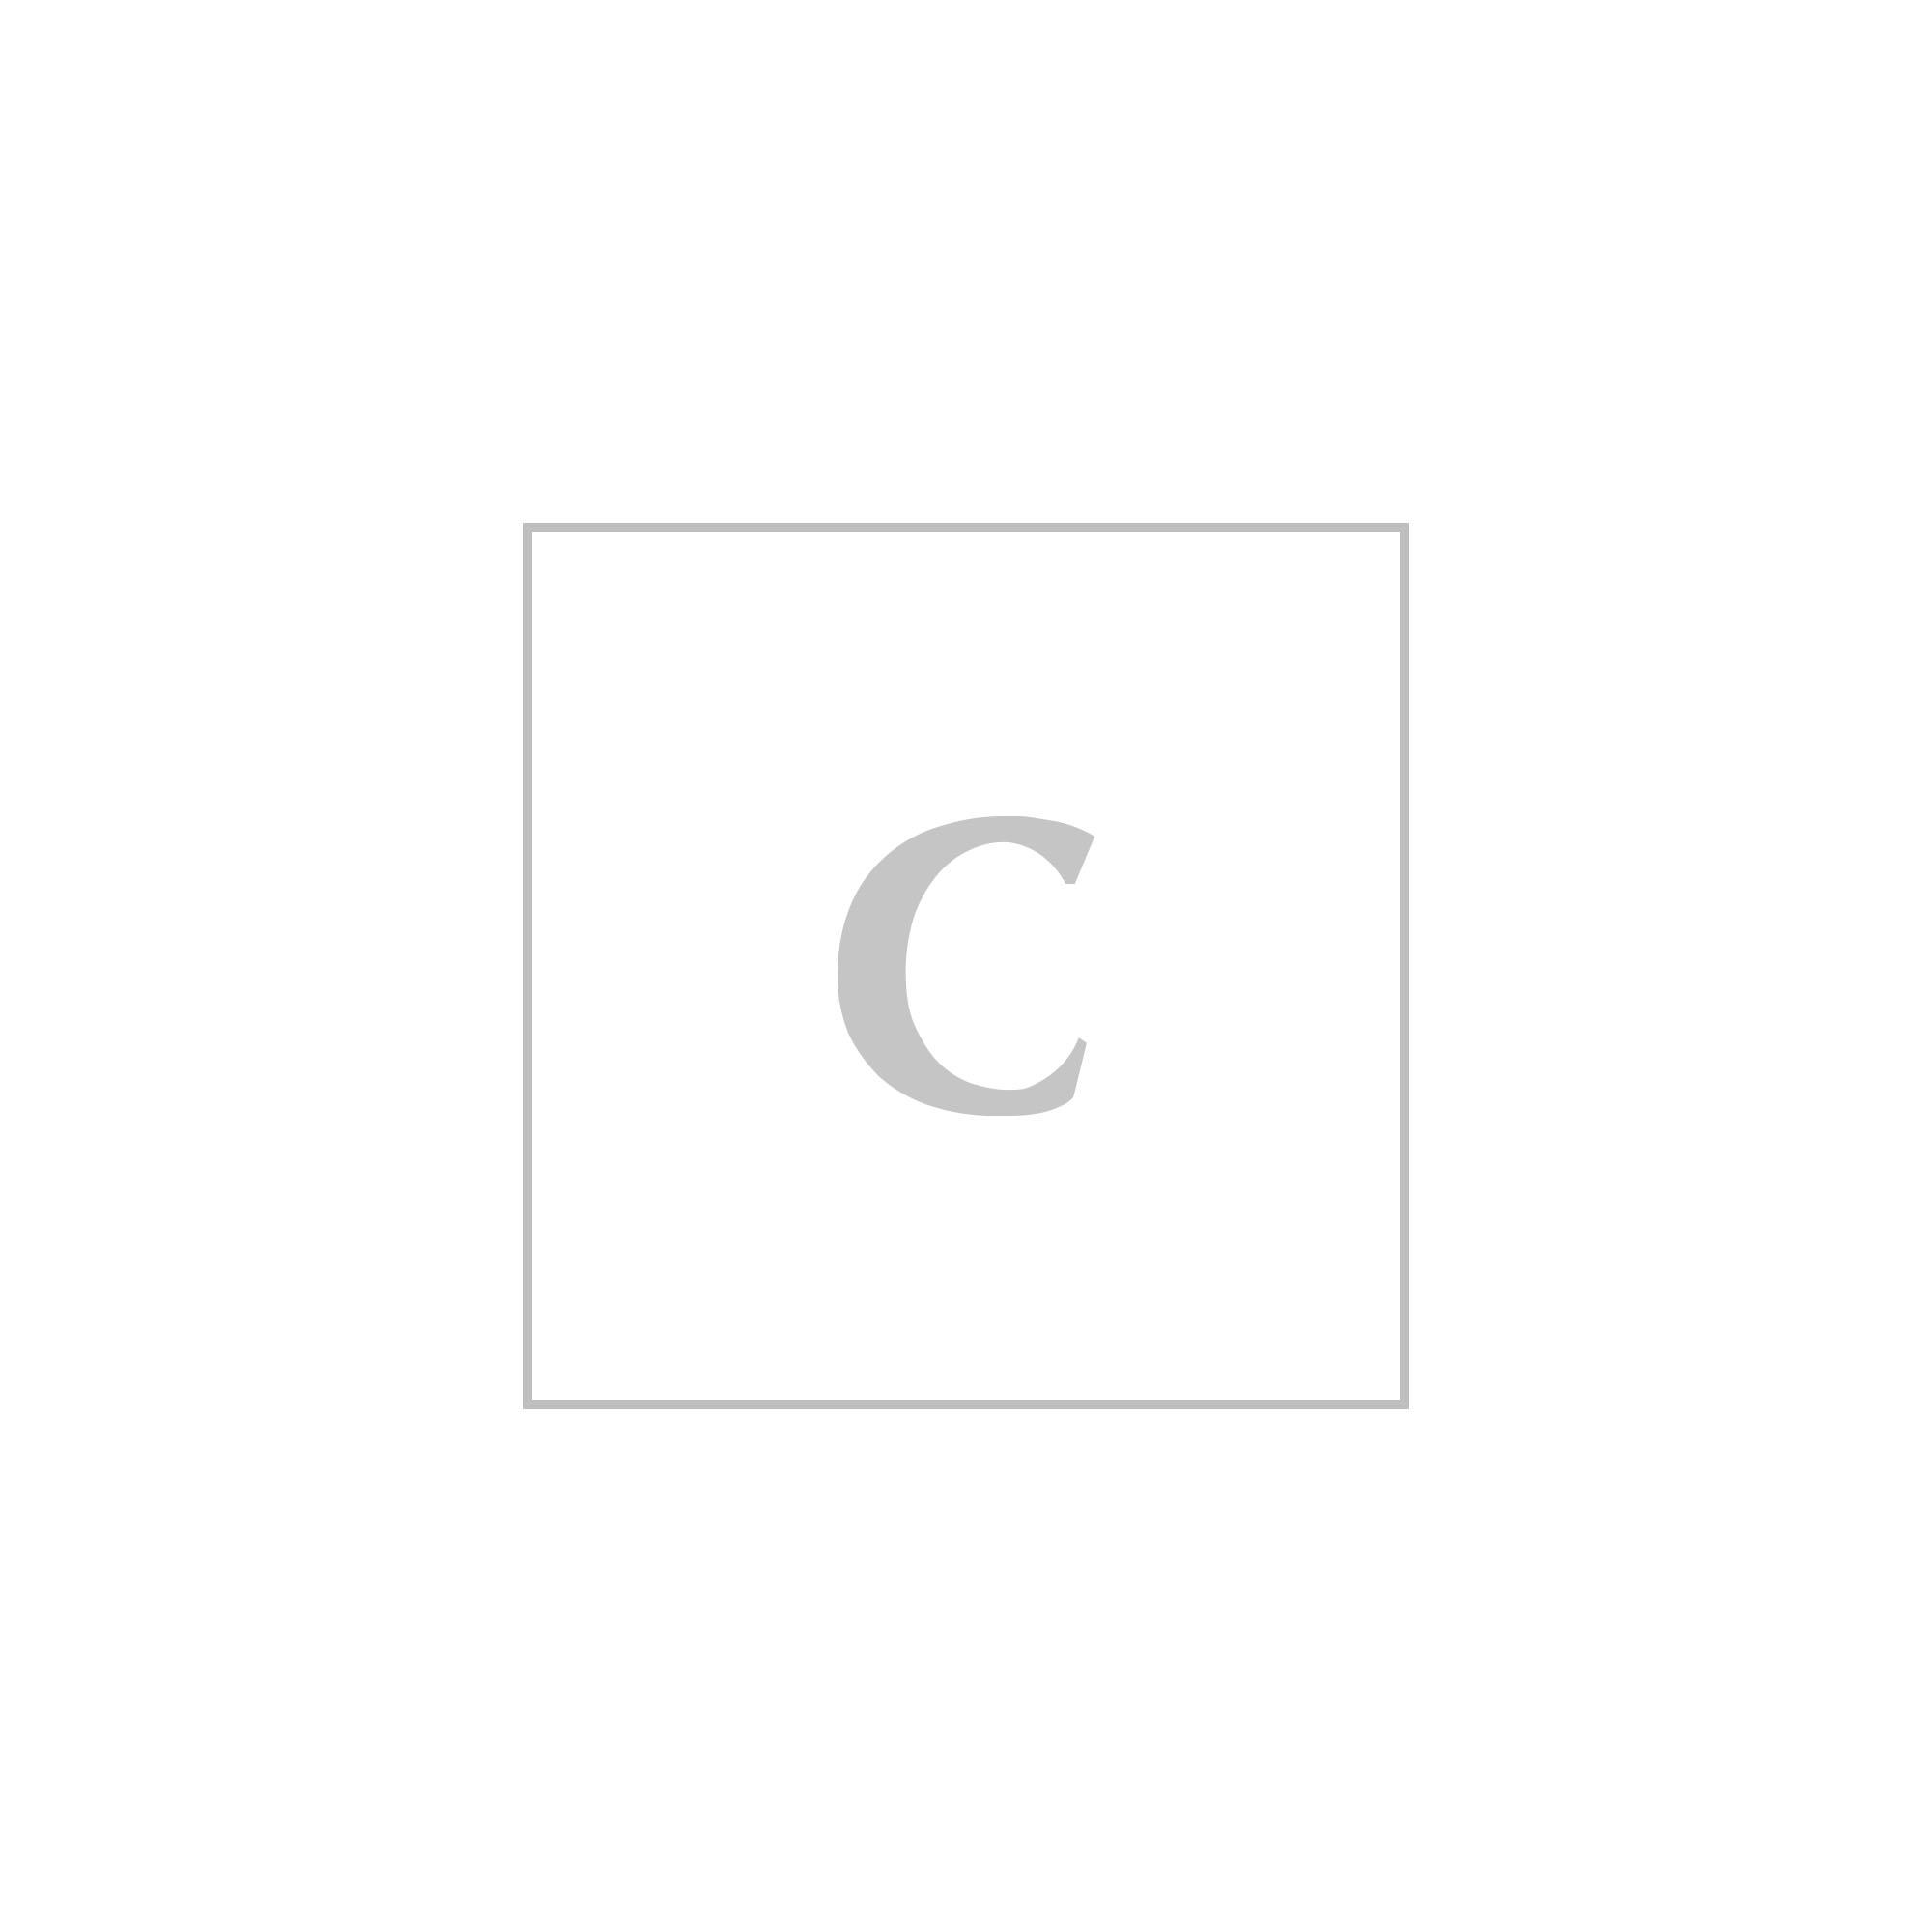 Christian Dior p.foglio lady dior cannage lambskin